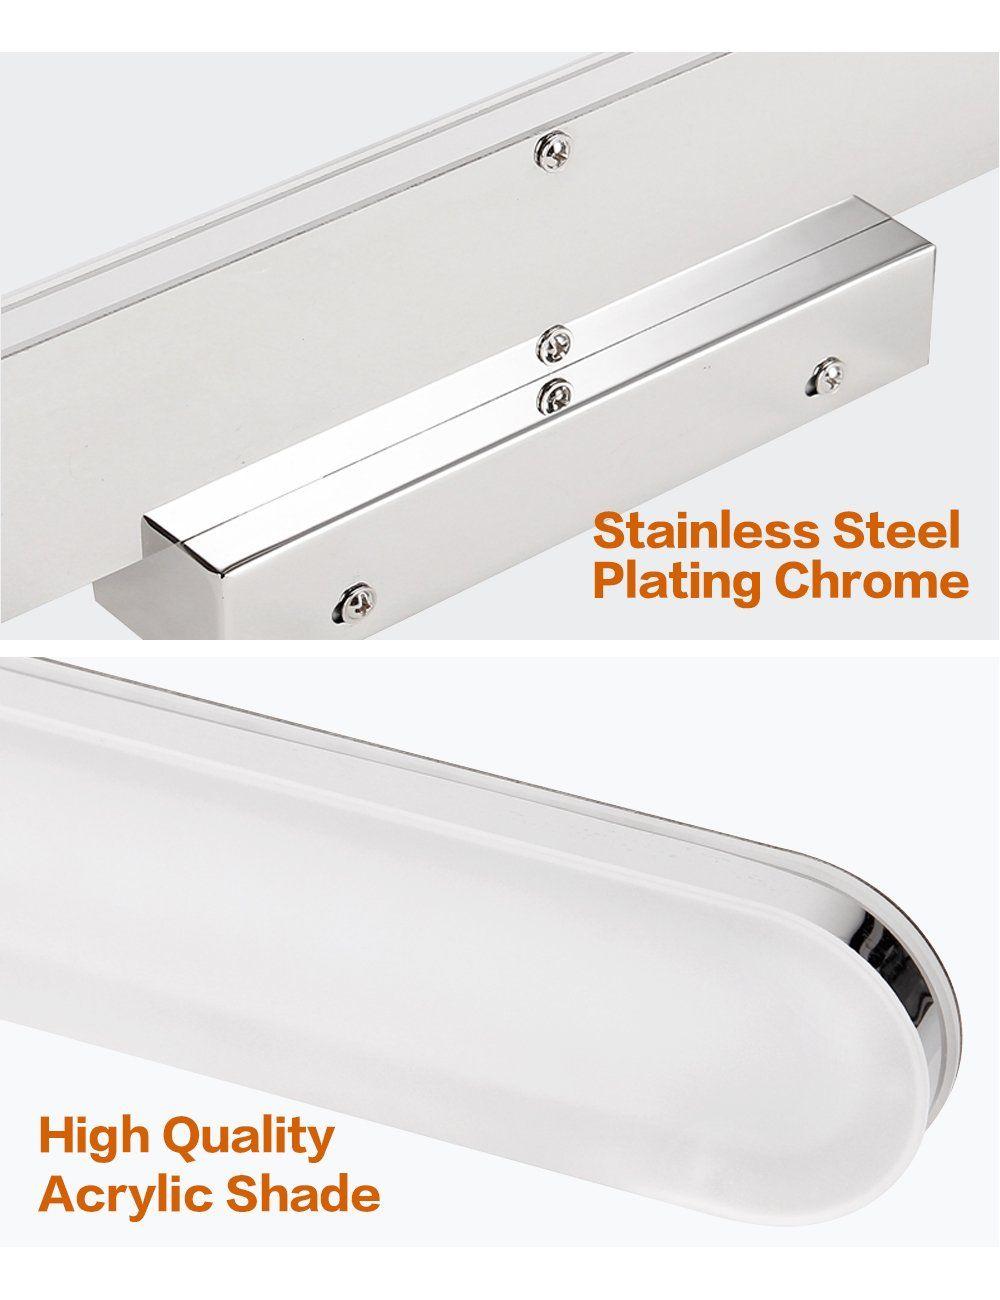 Led 31 5 Inch Bathroom Vanity Lighting Fixtures Stainless Steel